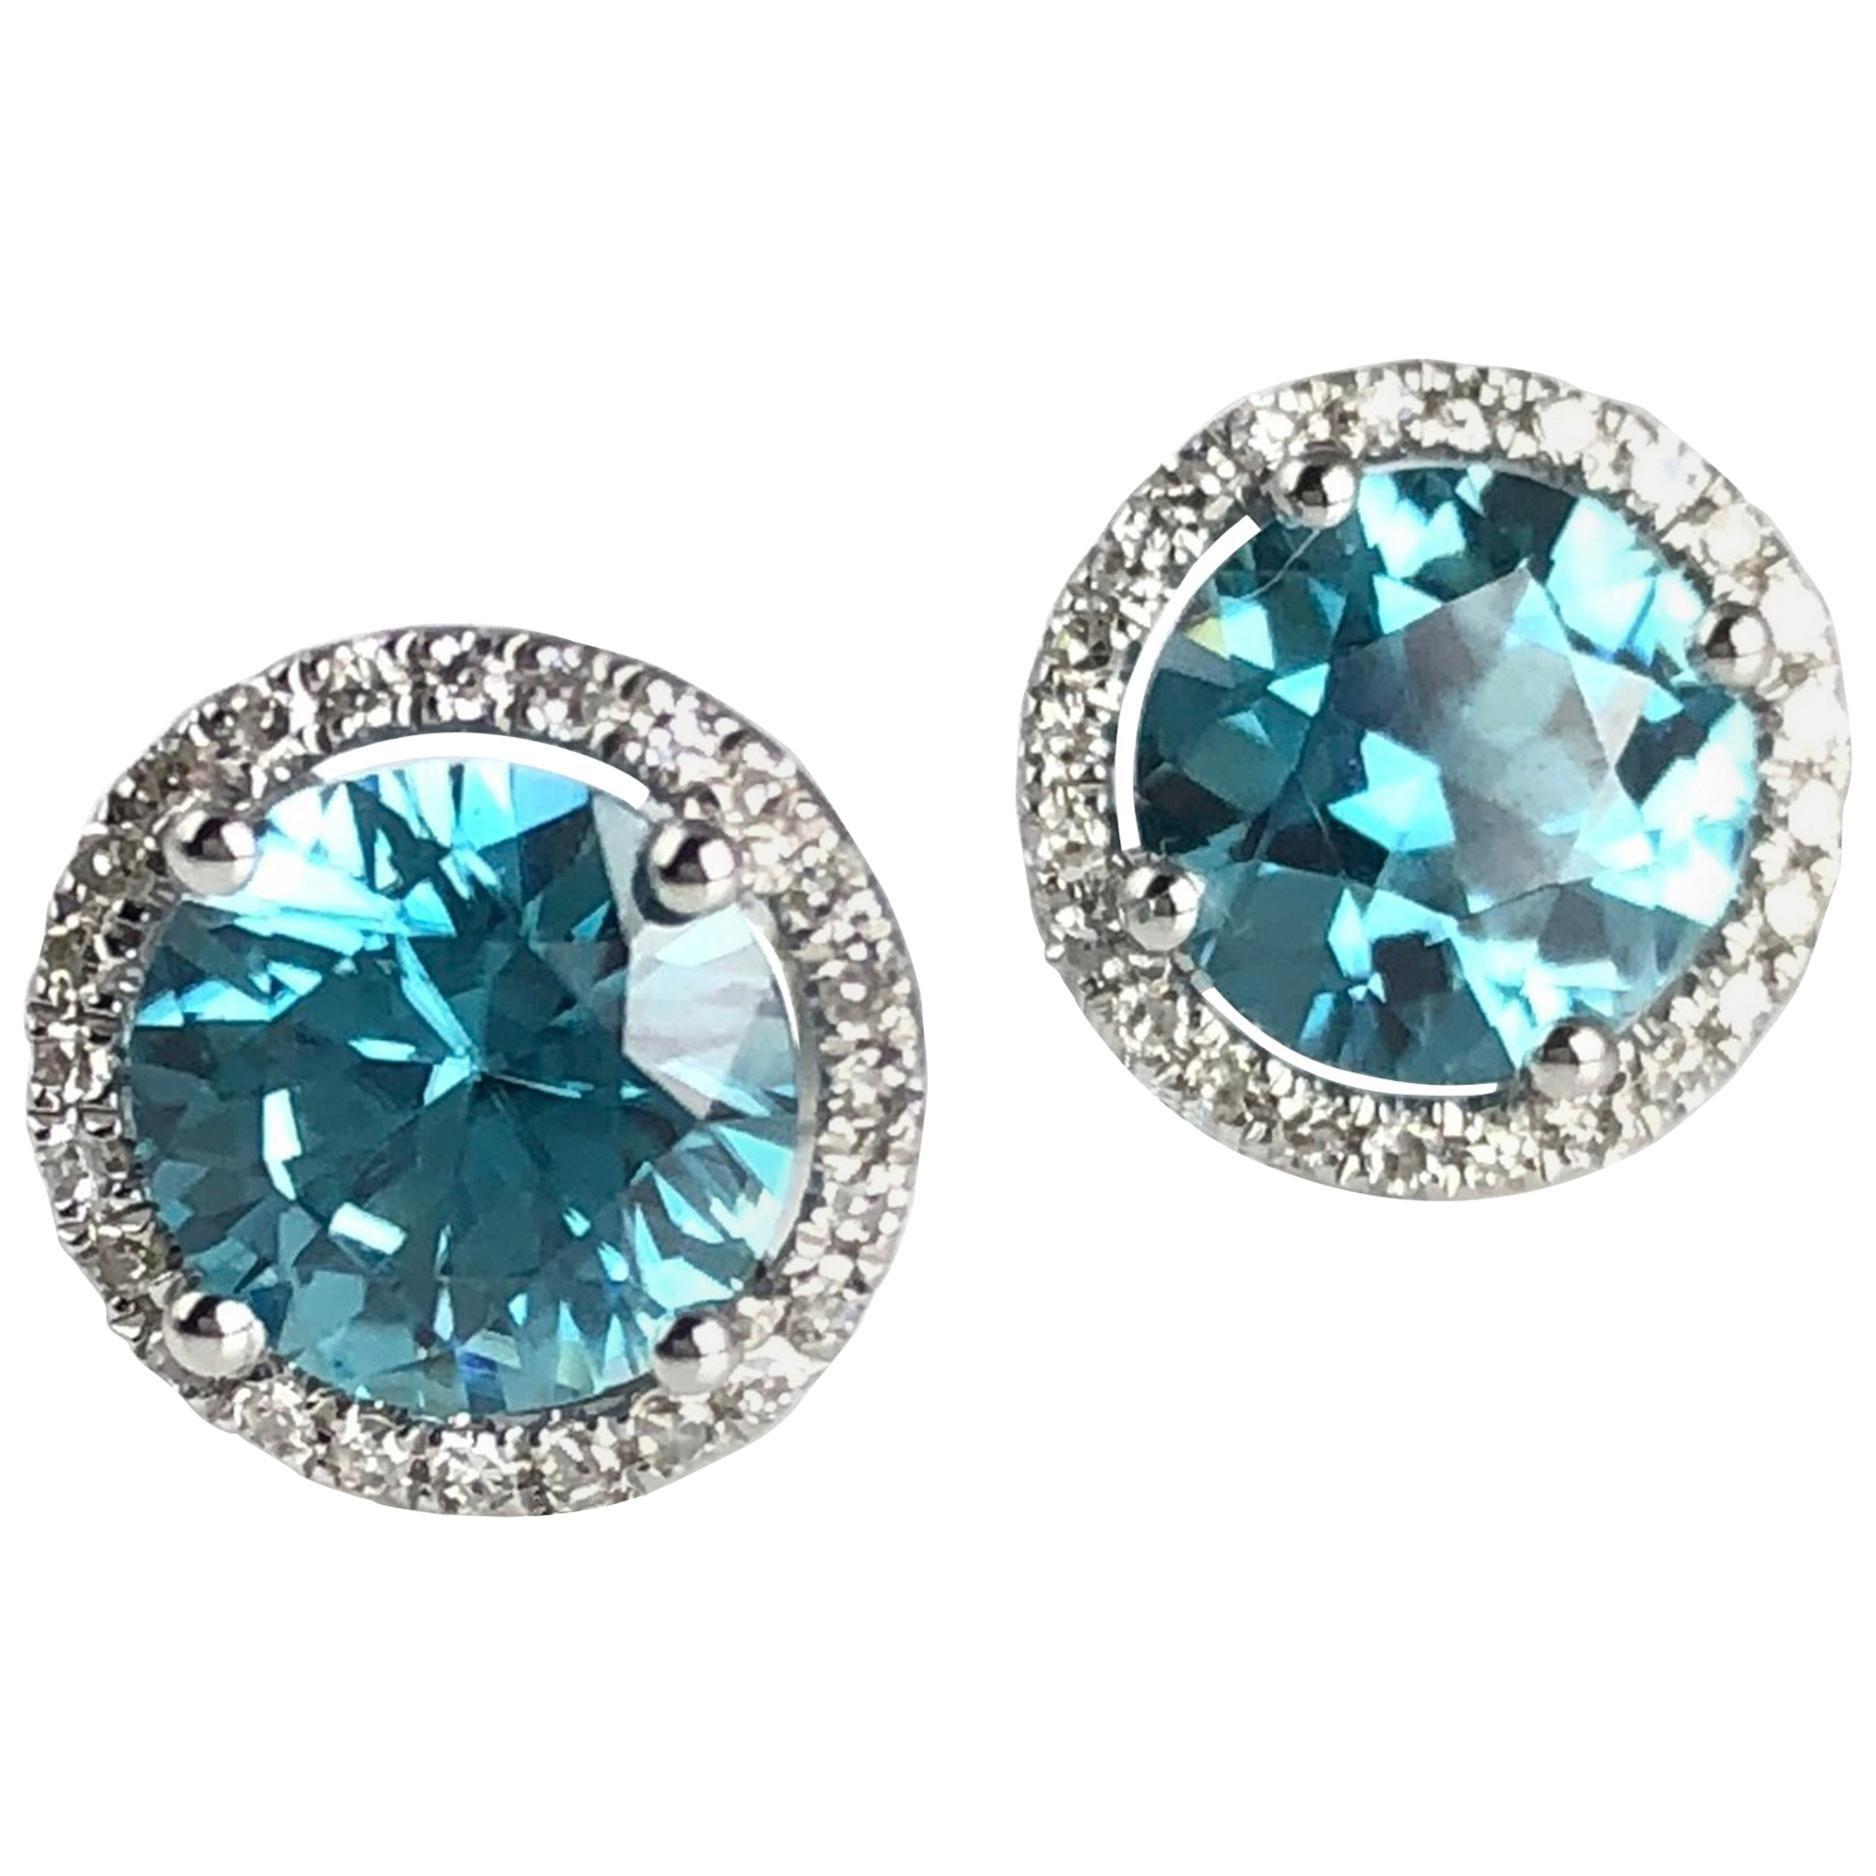 DiamondTown 2.99 Carat Blue Zircon Halo Stud Earrings in 14 Karat White Gold